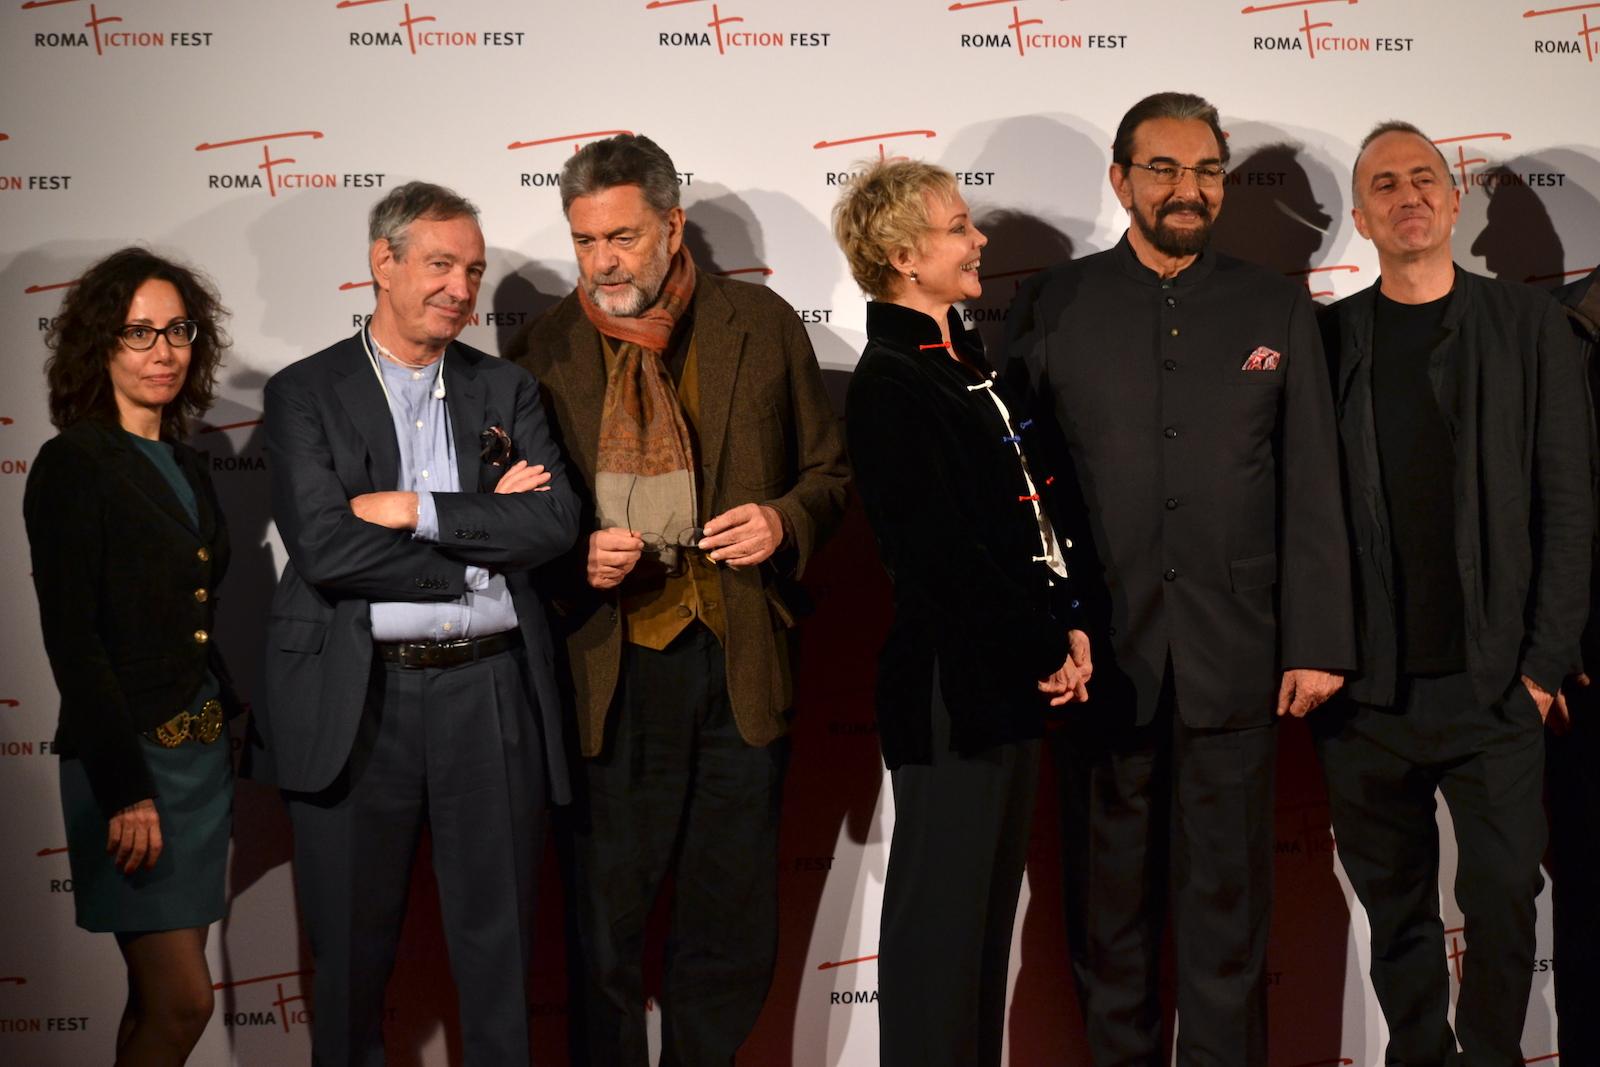 Roma Fiction Fest 2015: Stefano Sollima, Samanta Sollima, Kabir Bedi, Carole André, Andrea Giordana sul red carpet di Sandokan